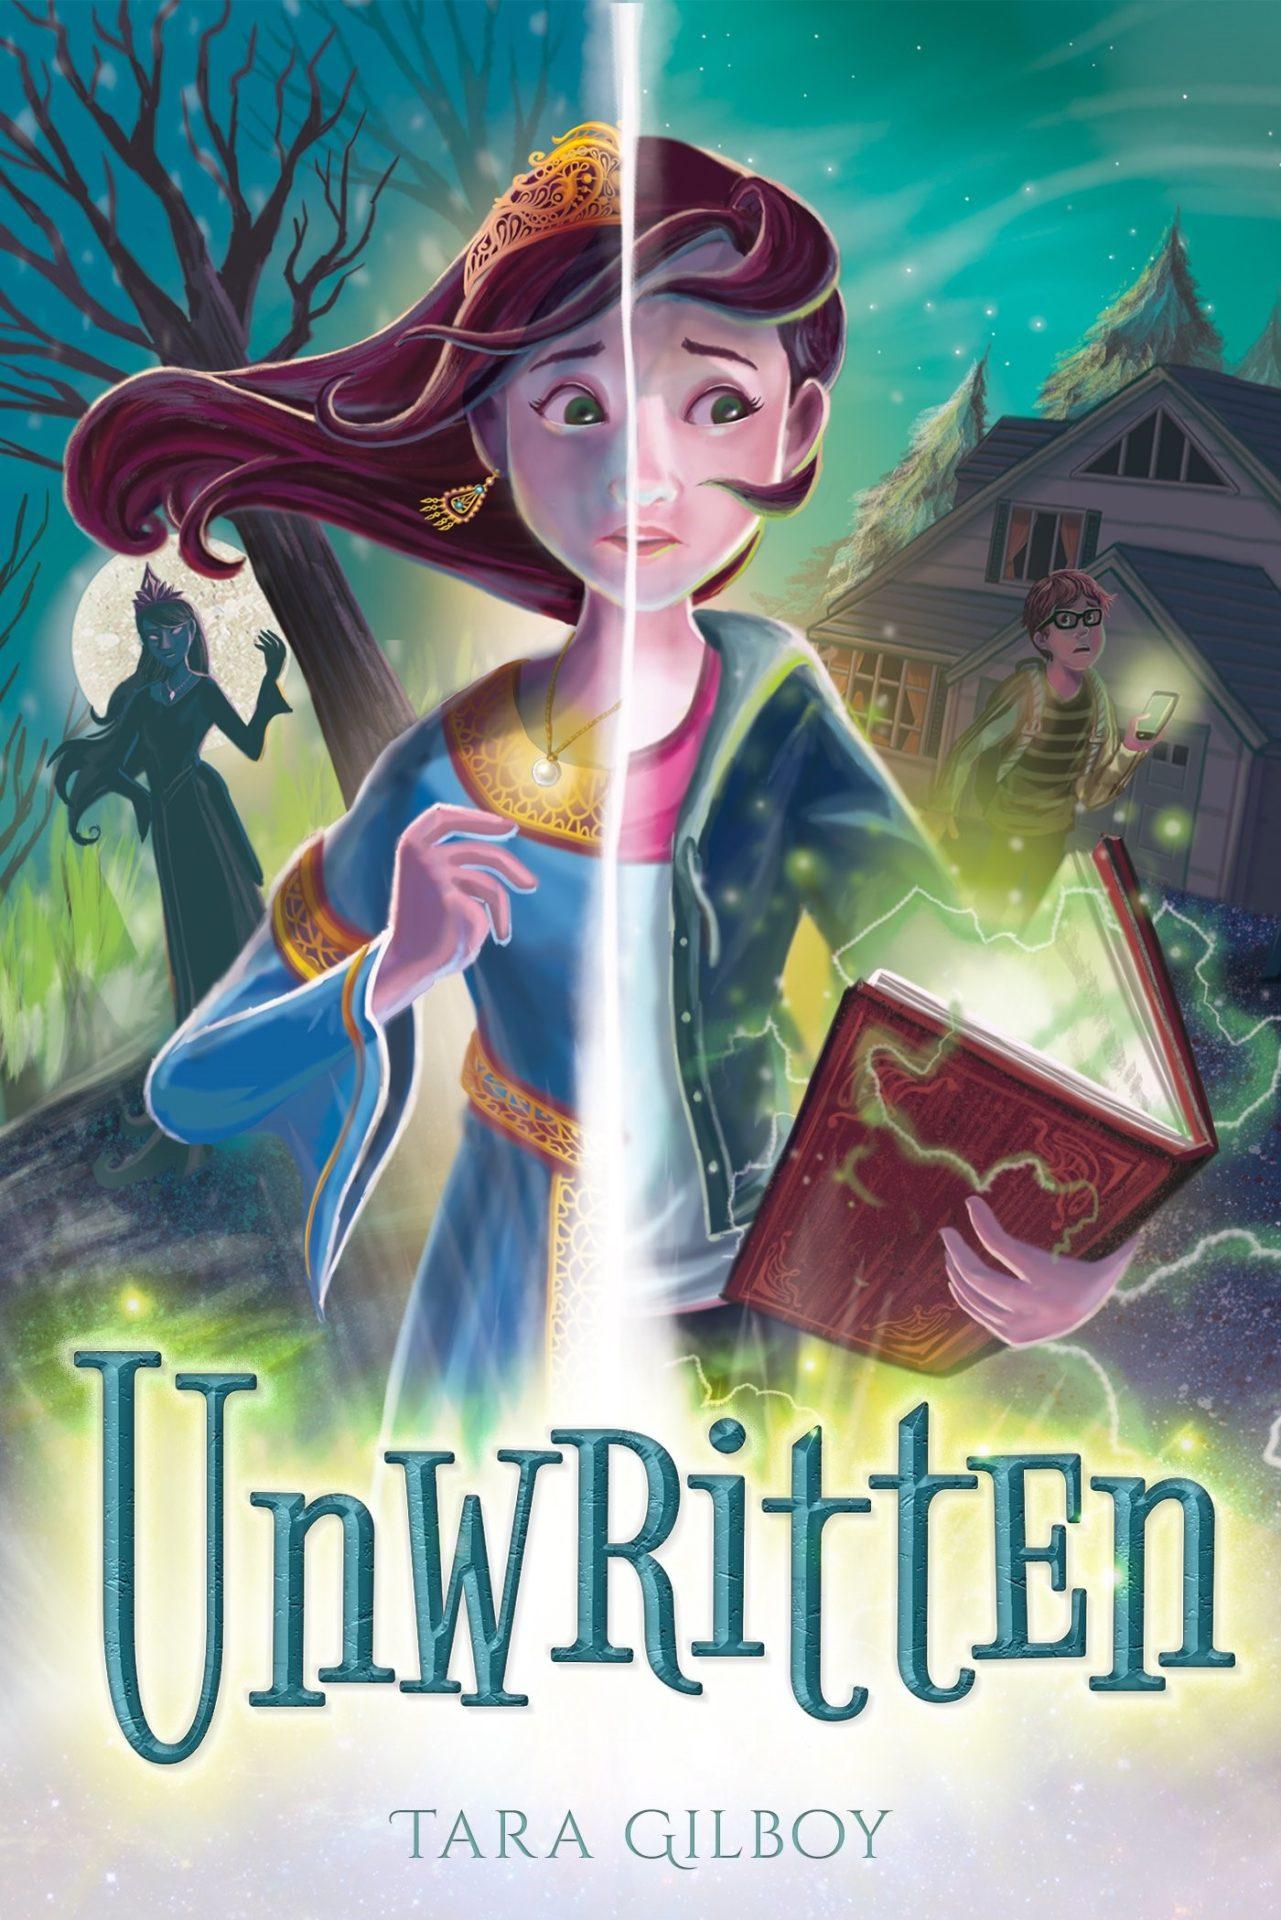 Unwritten & Rewritten – Tara Gilboy